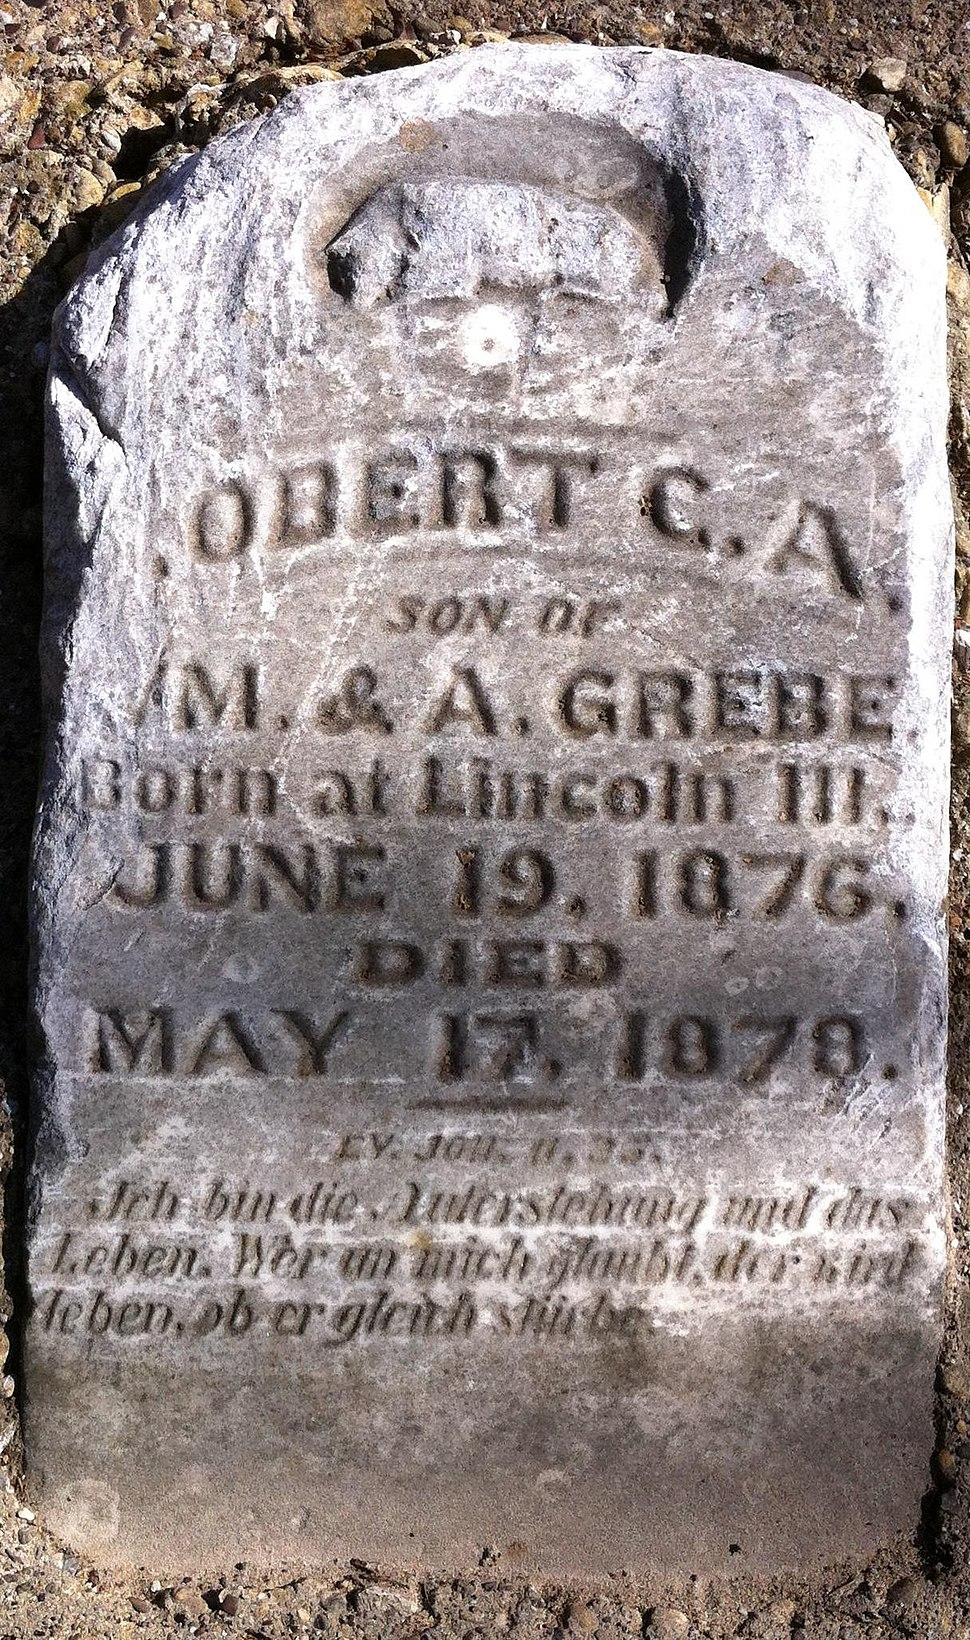 English-German tombstone in Texas